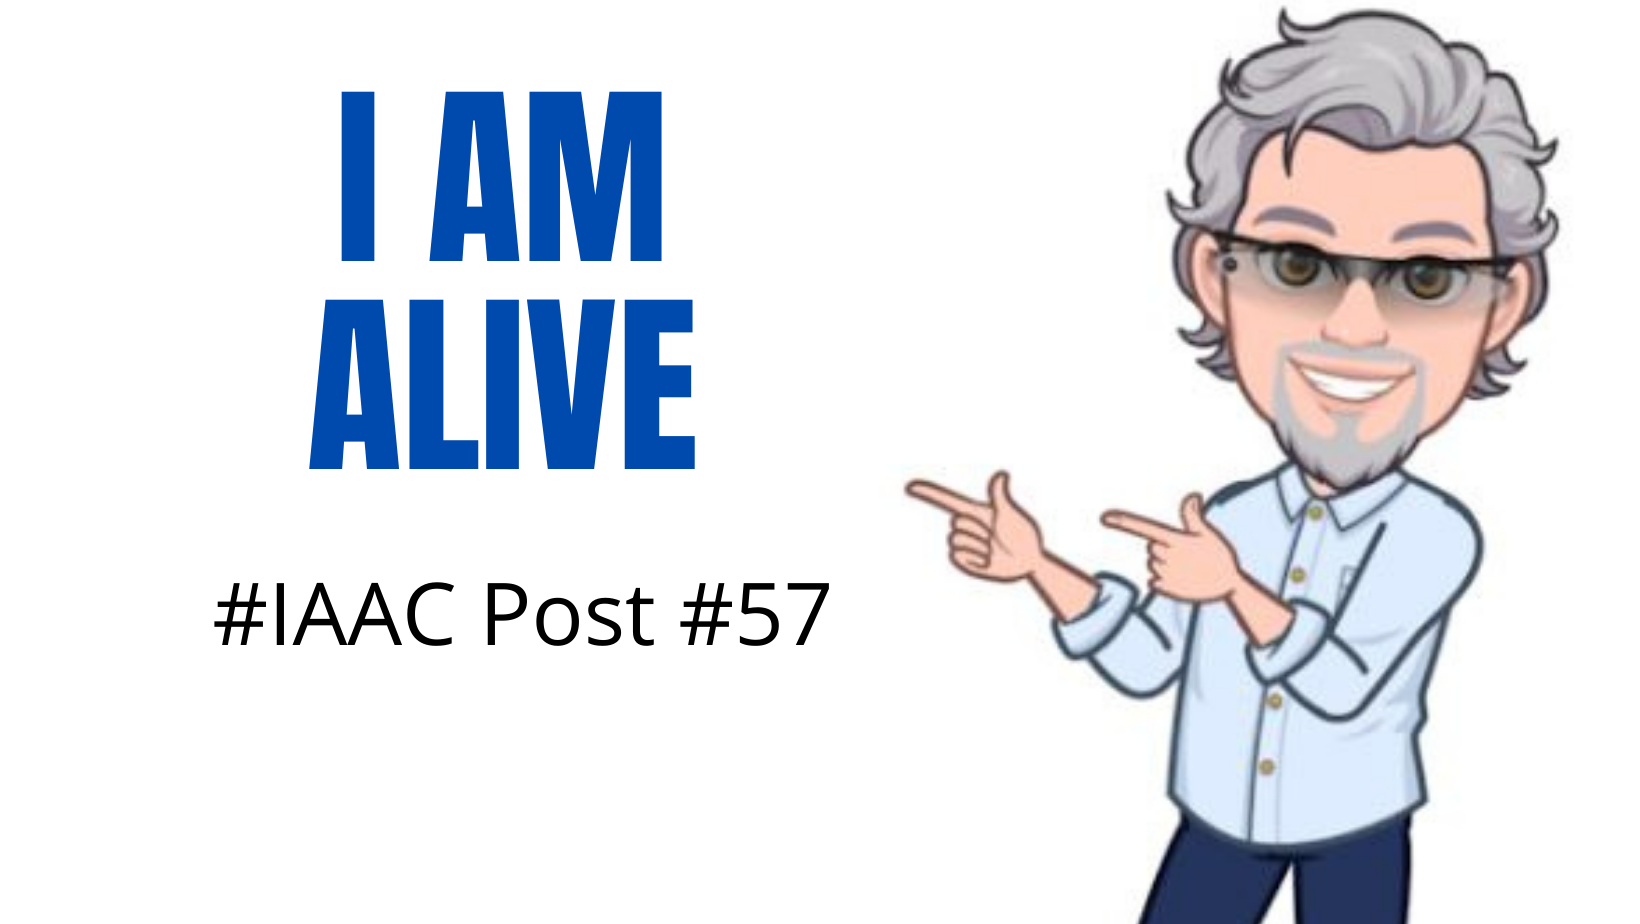 I AM ALIVE (3).png